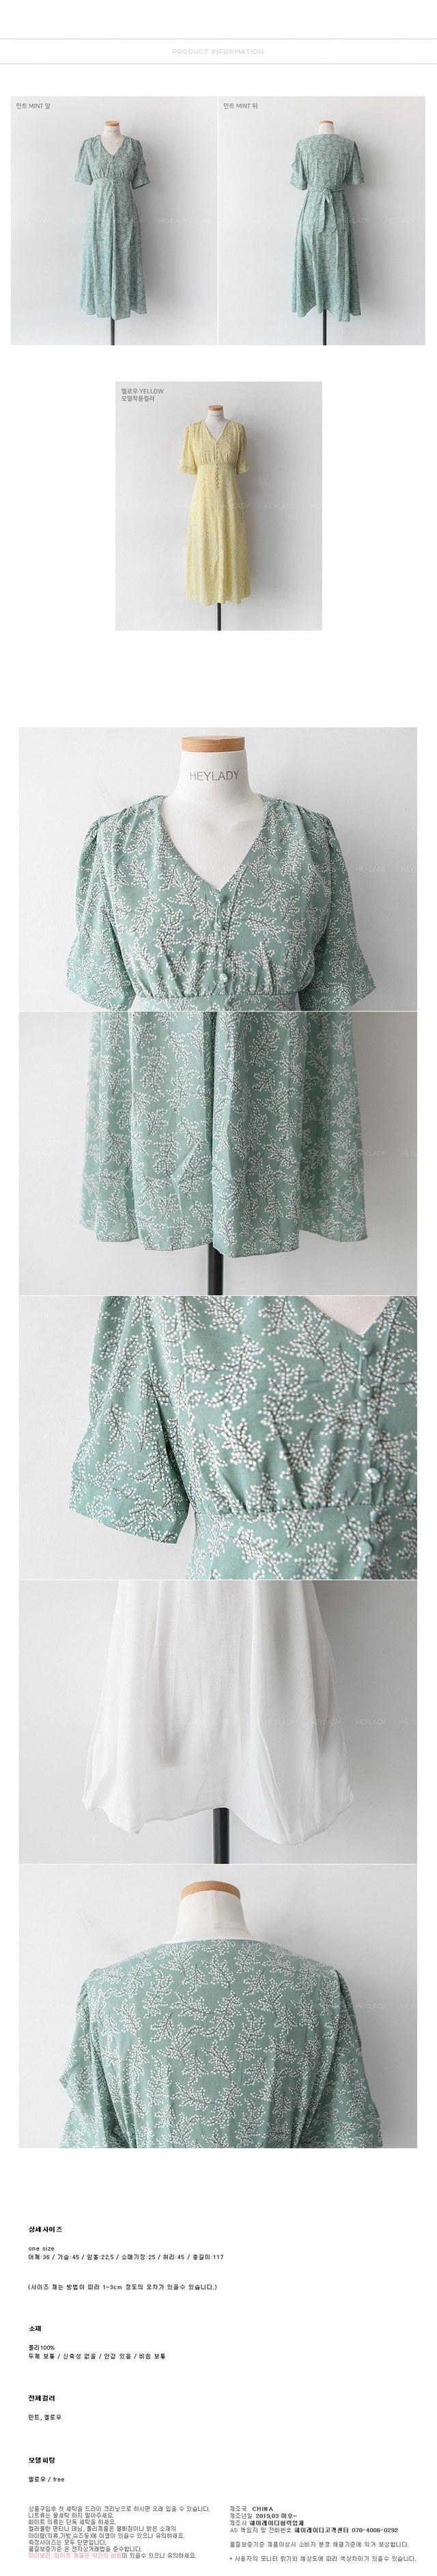 Wonder Button Puff Dress